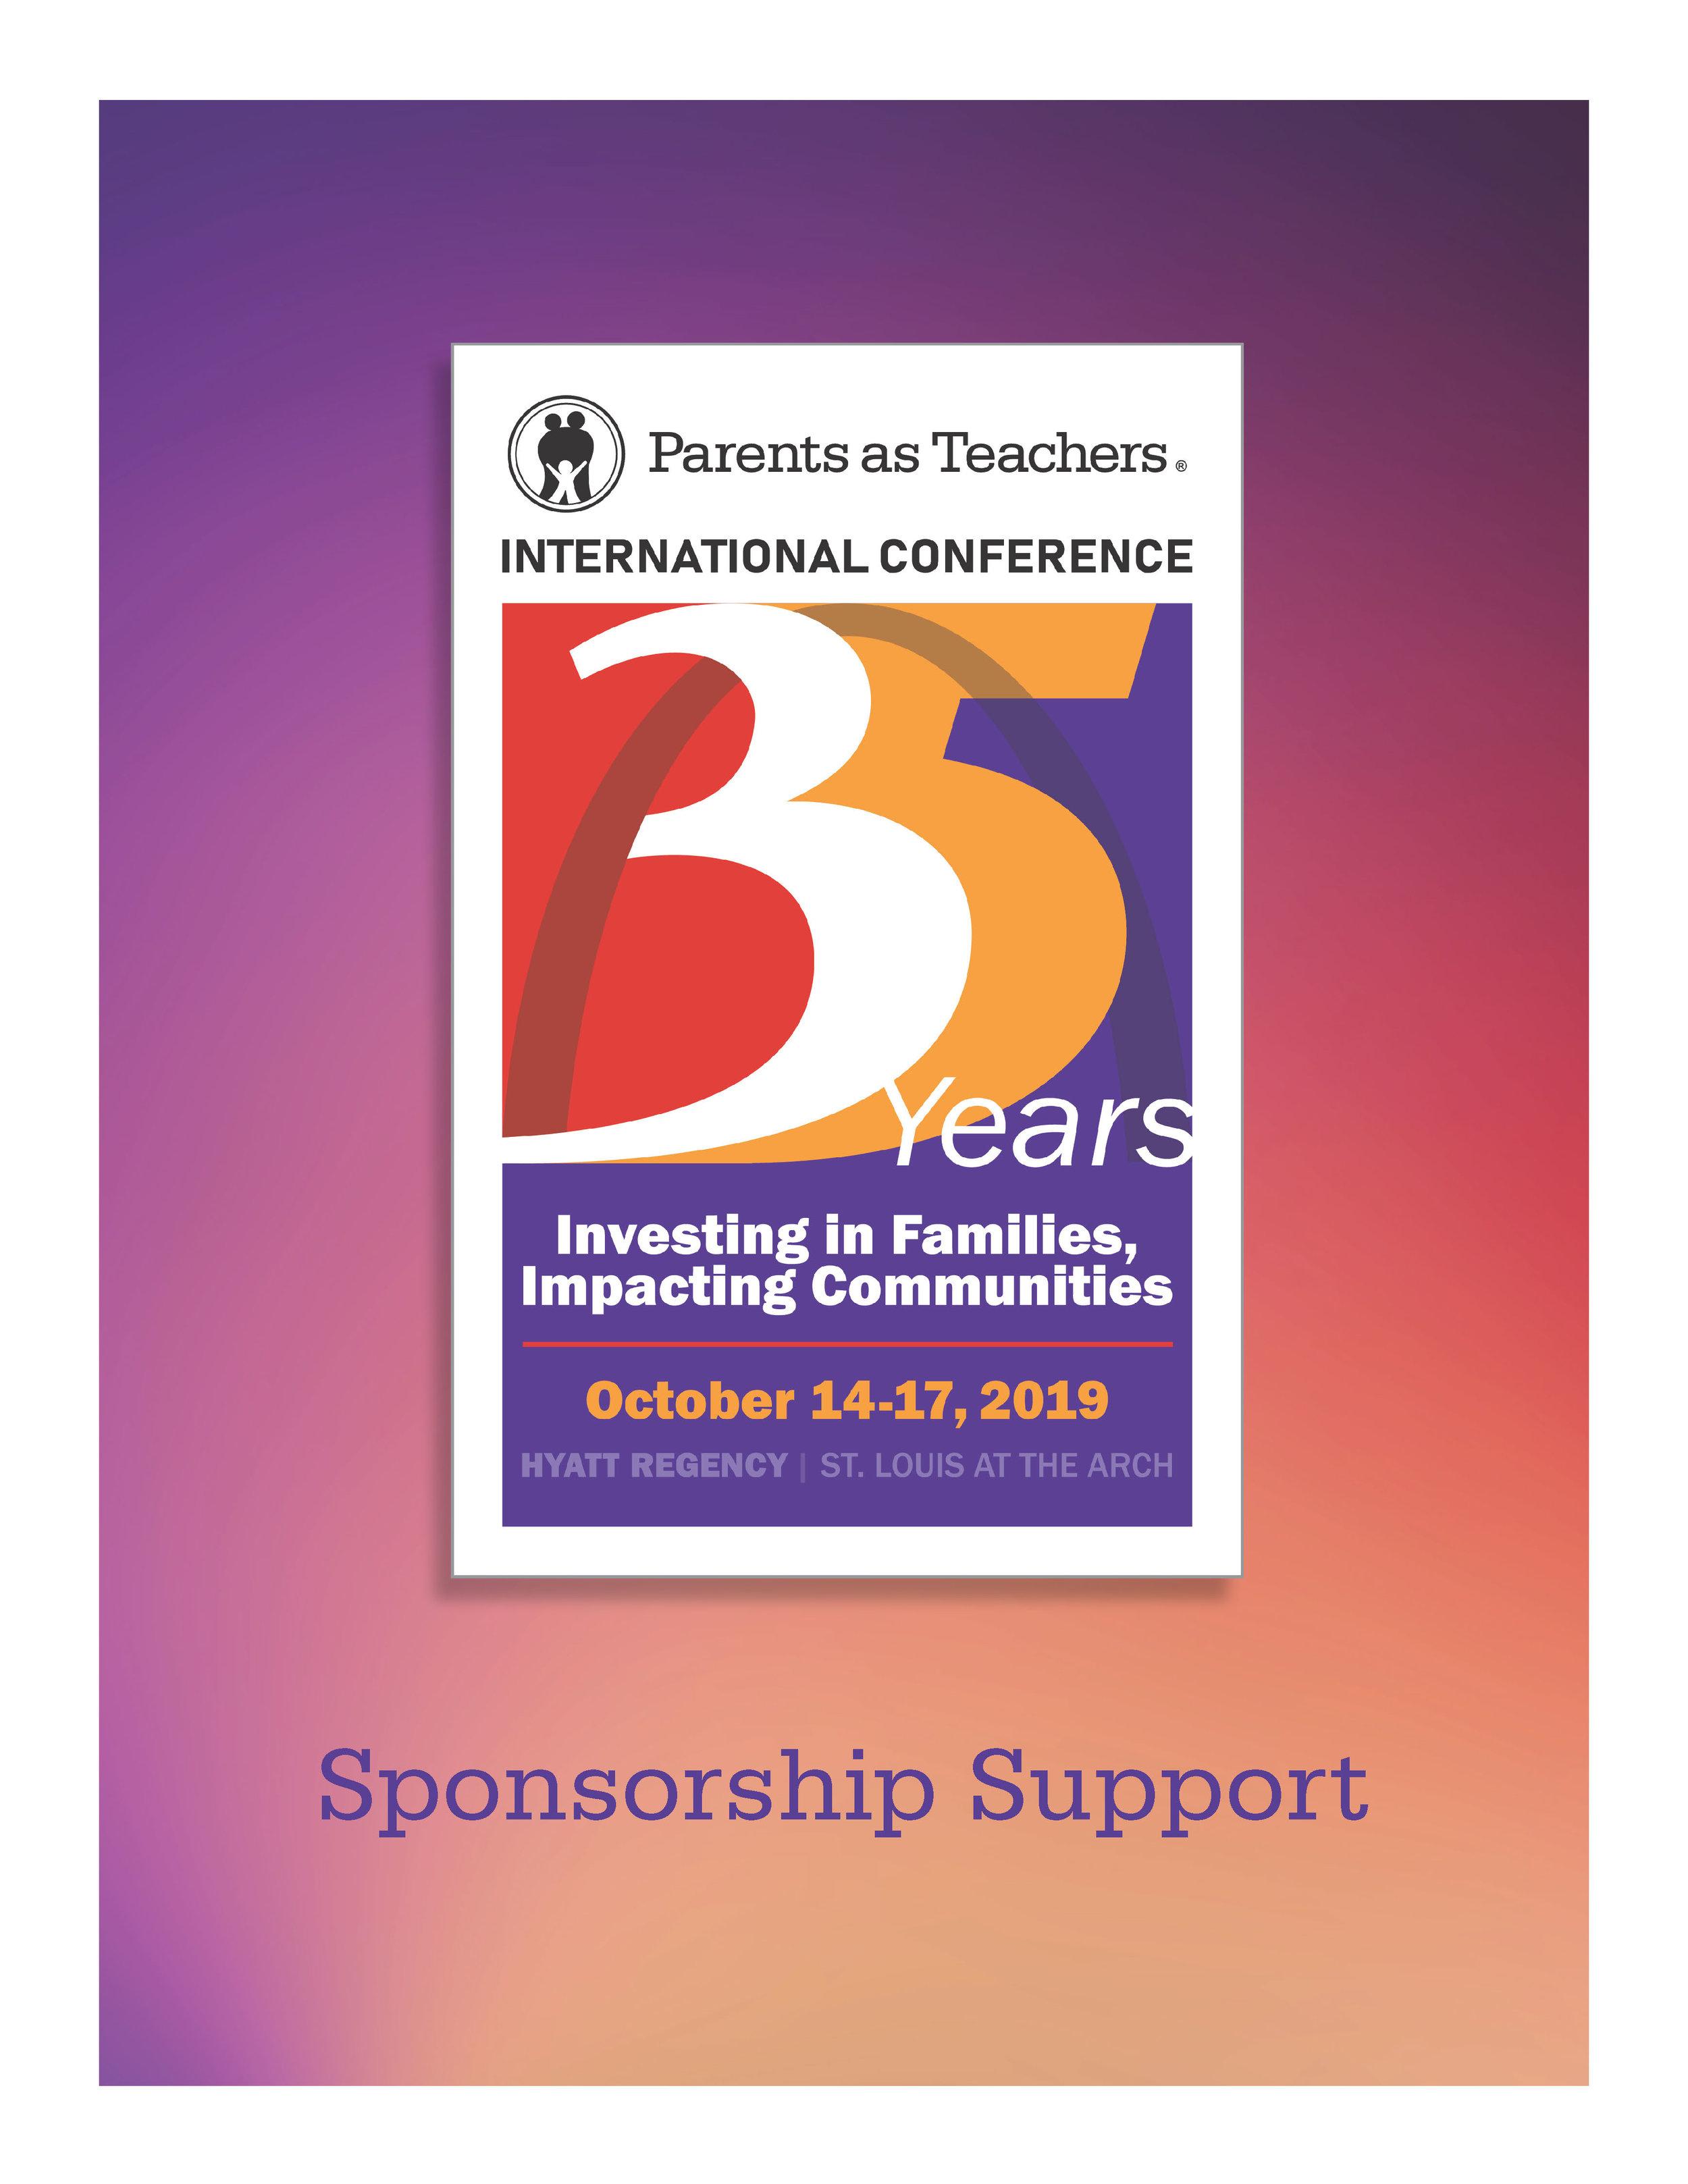 Click image to download sponsorship book